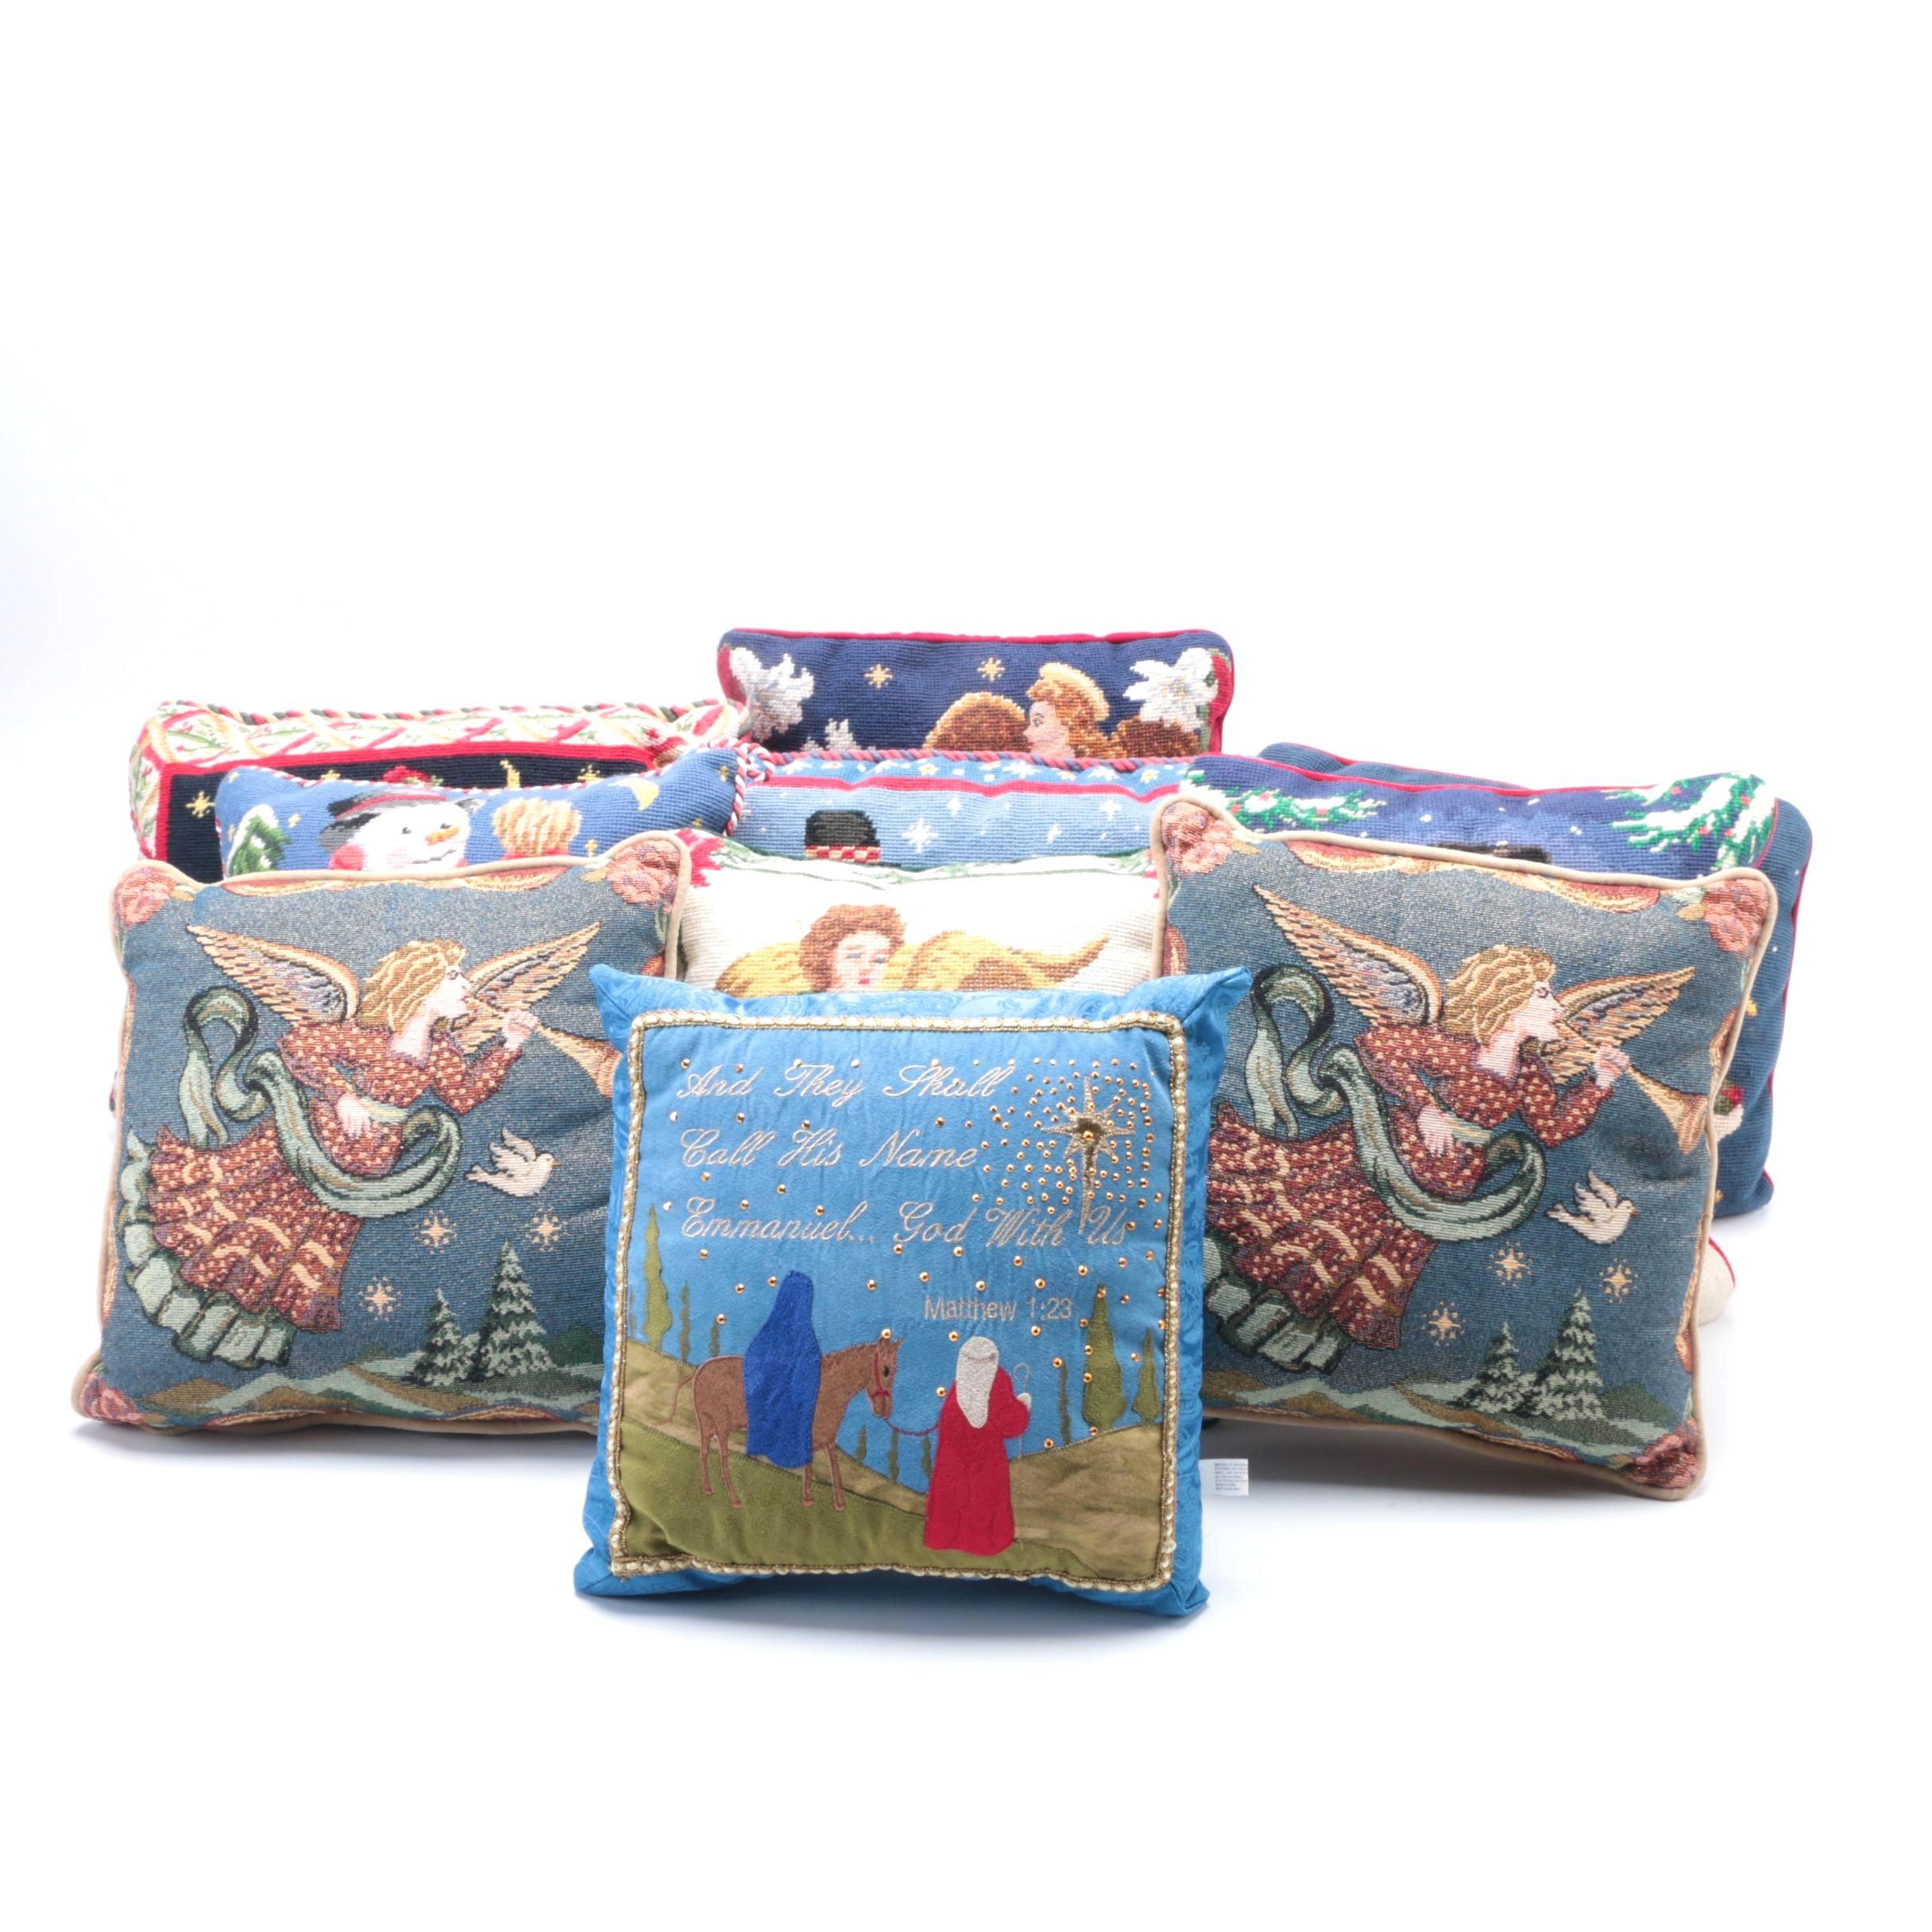 Assortment of Christmas Themed Throw Pillows